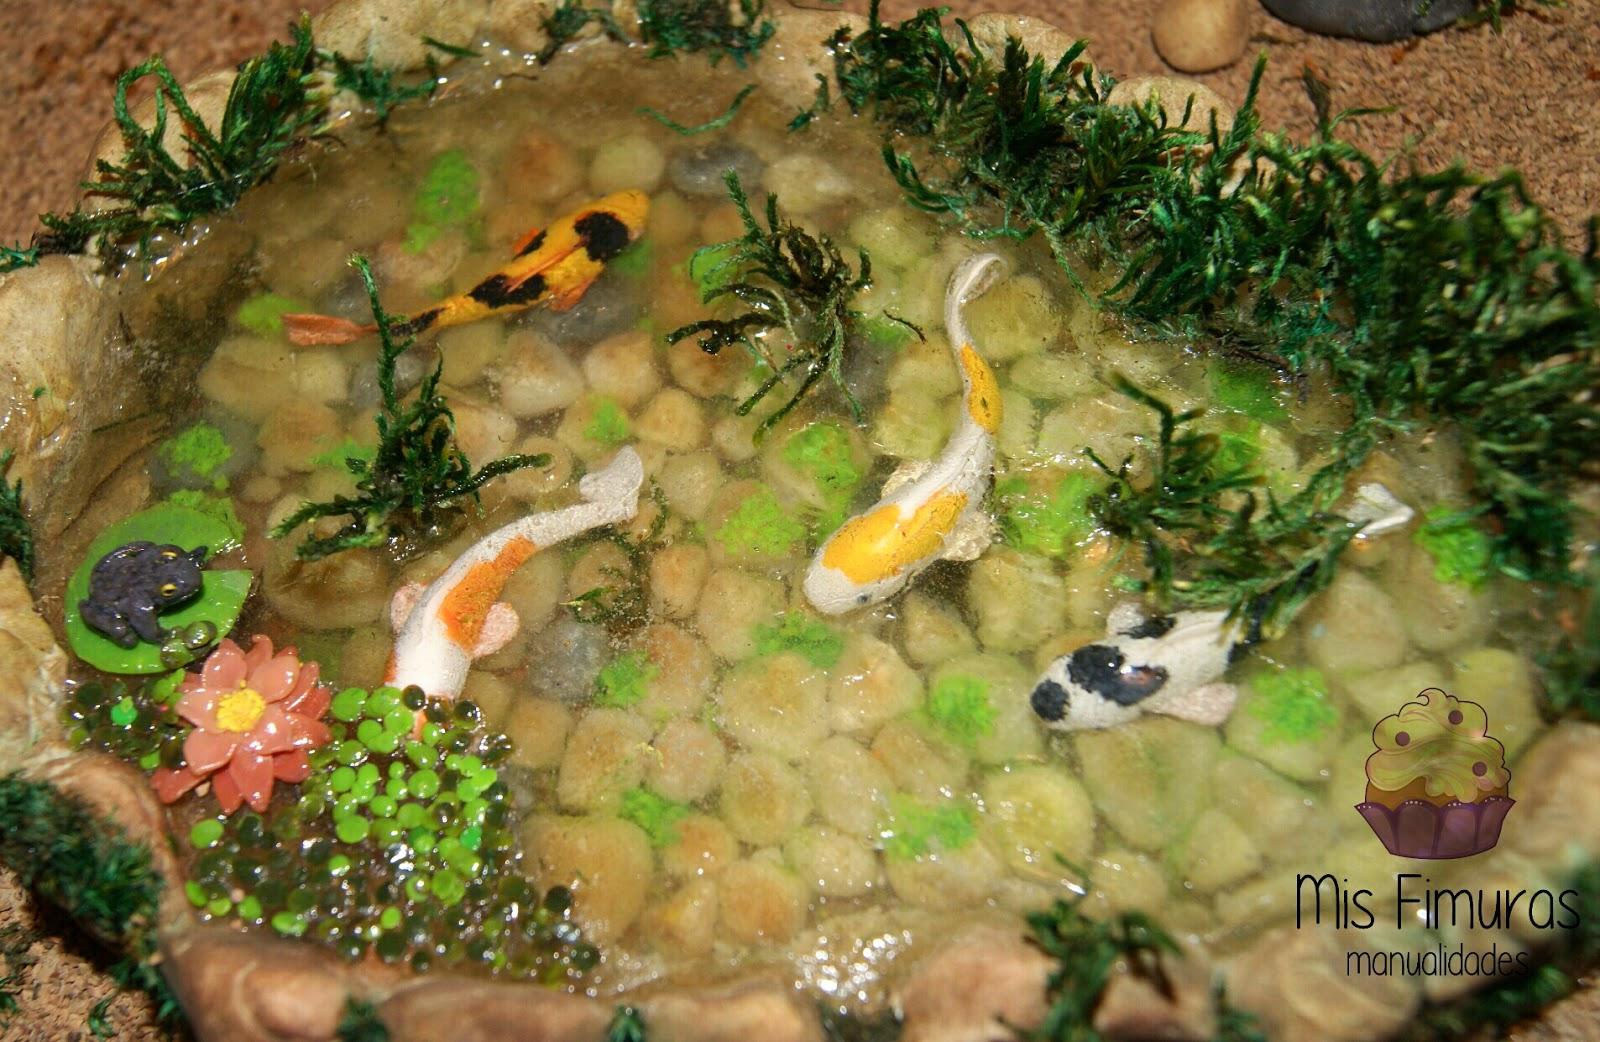 Mis fimuras estanque carpas koi for Como hacer un criadero de carpas